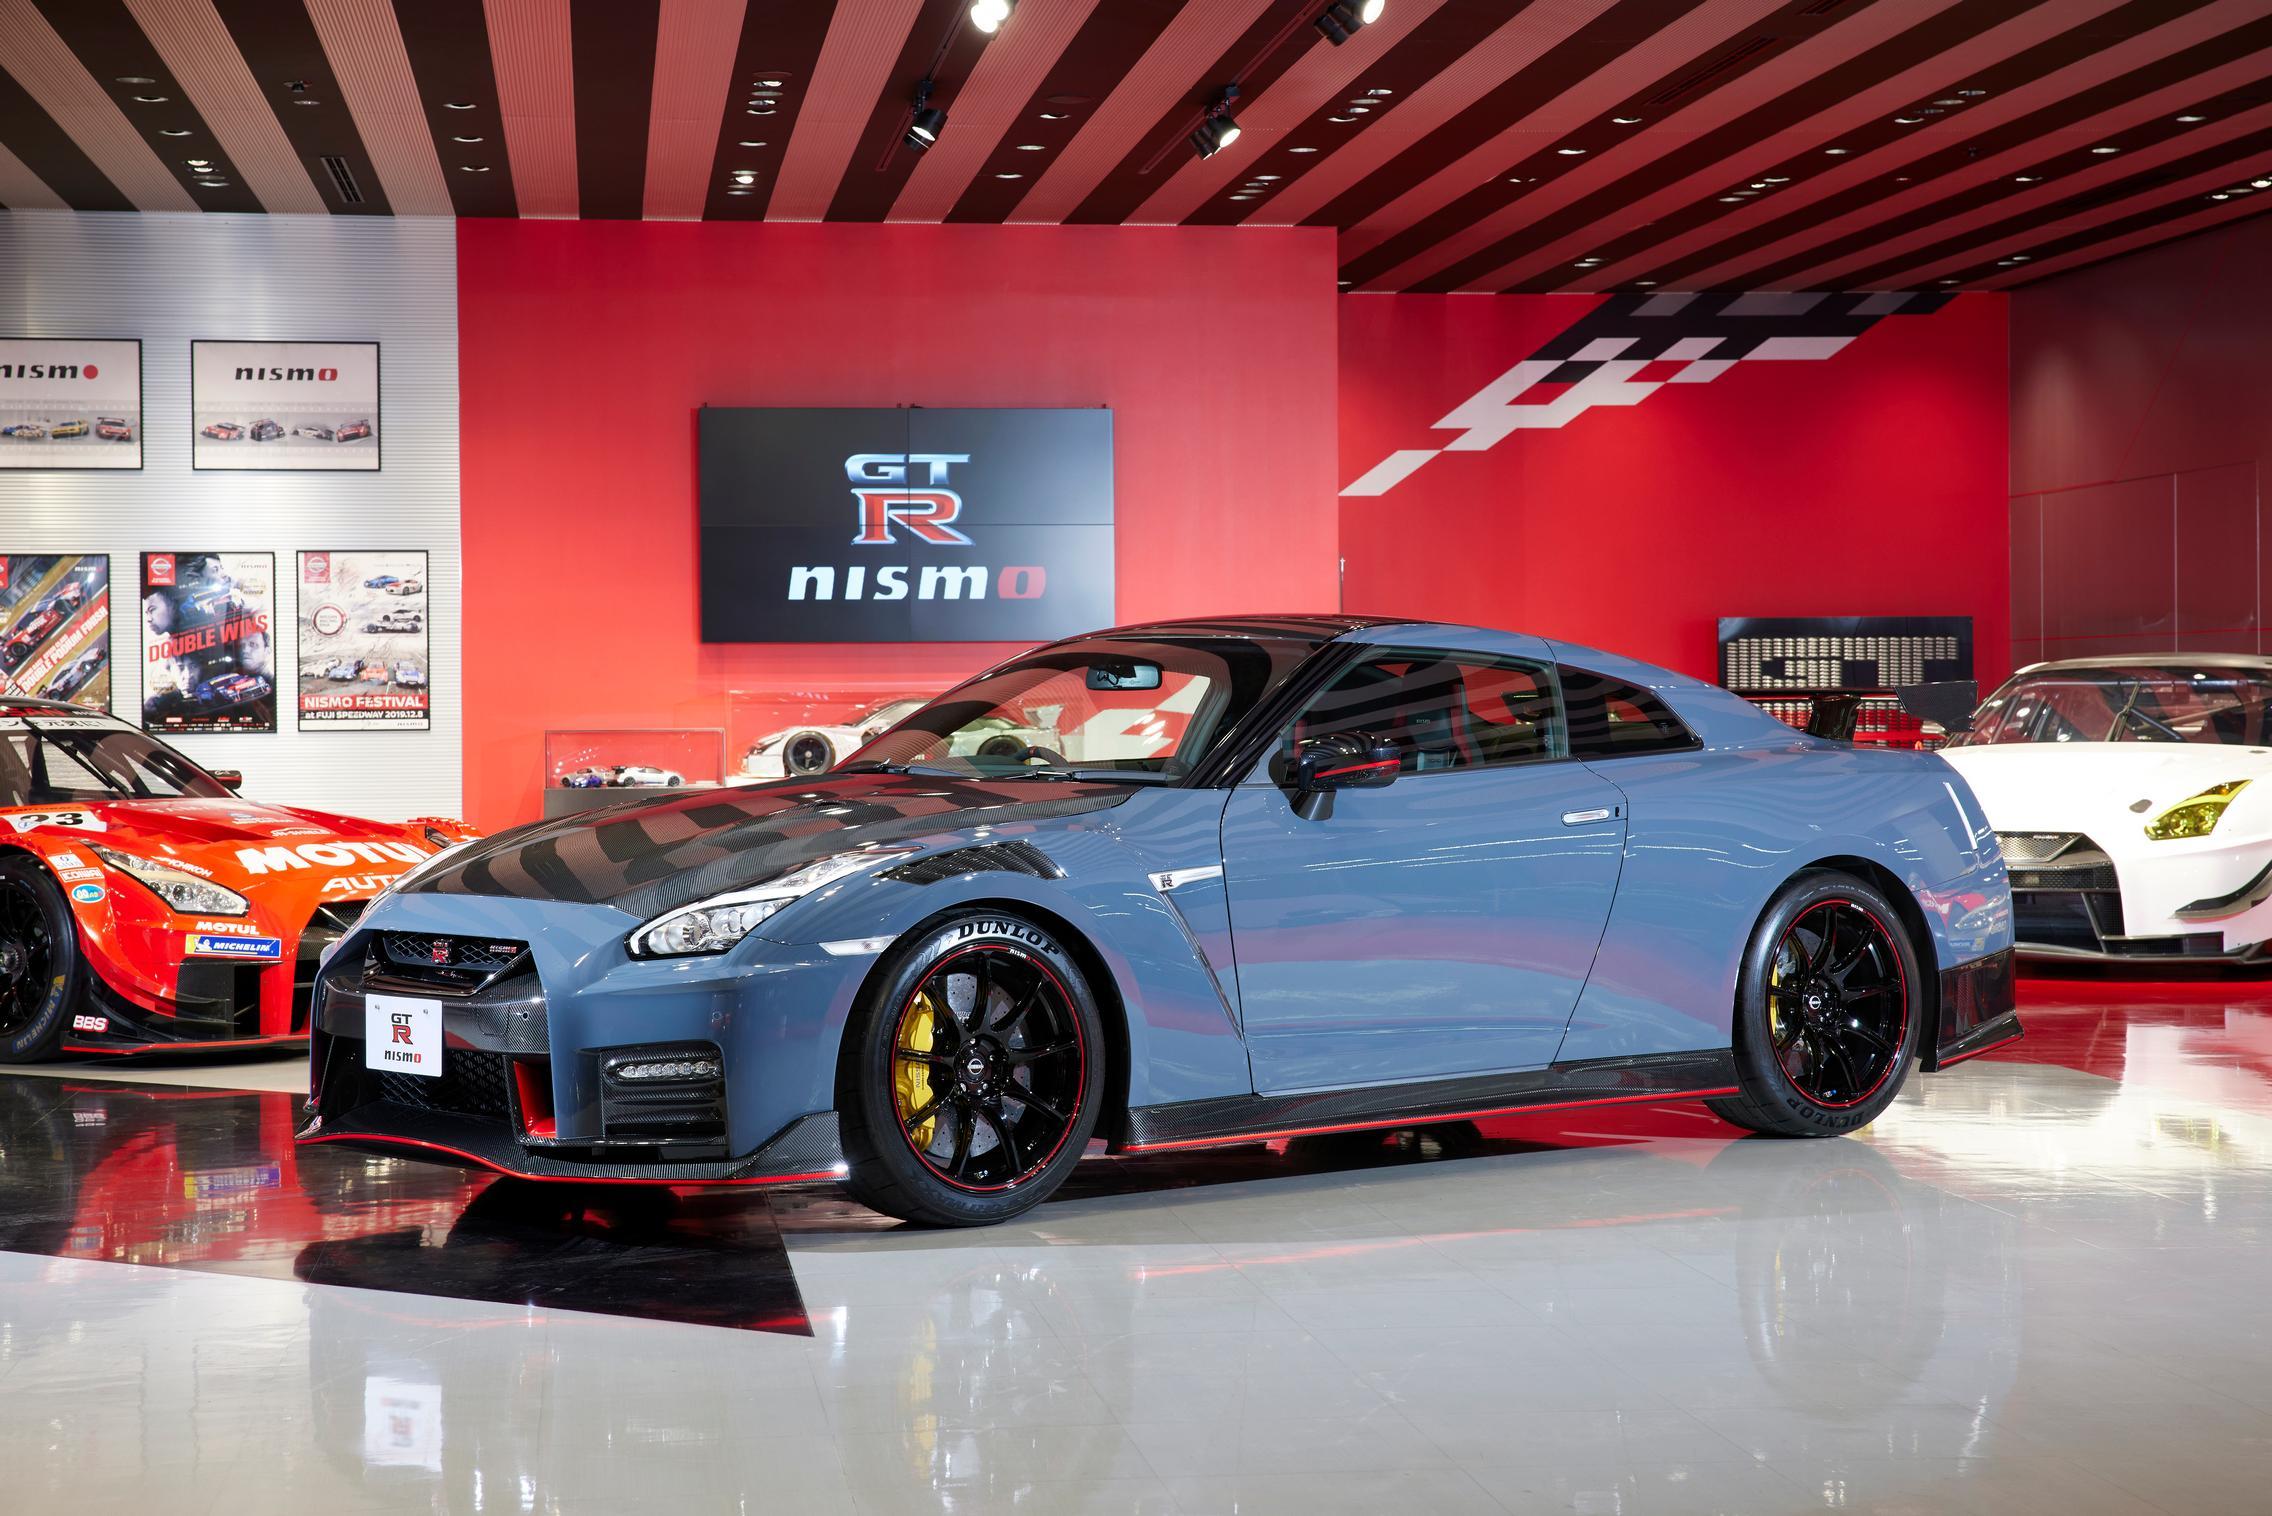 2022 Nissan GT-R Nismo specs